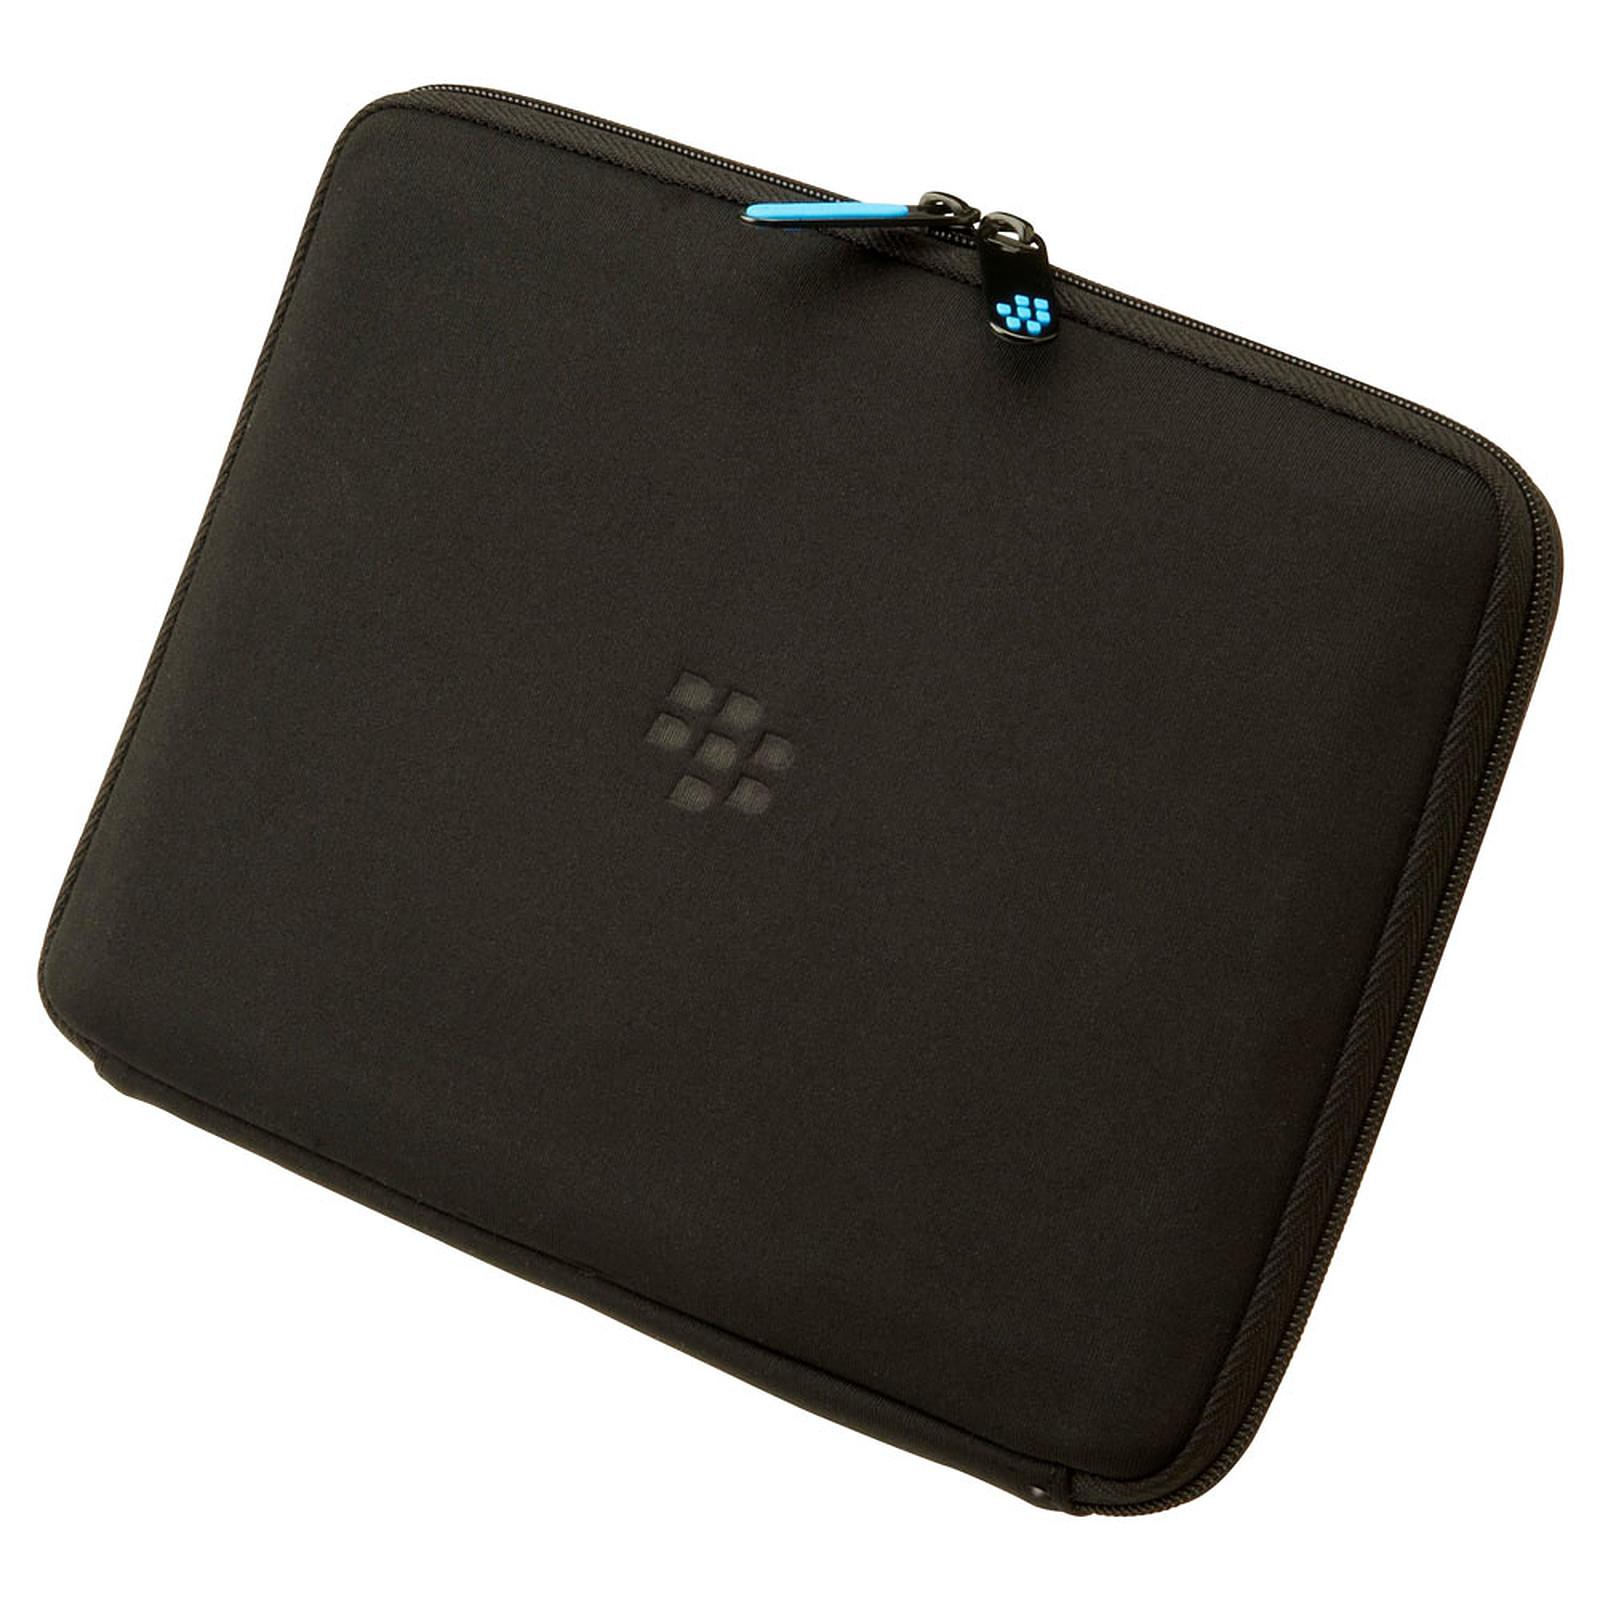 BlackBerry PlayBook Zip Sleeve Noir/Bleu